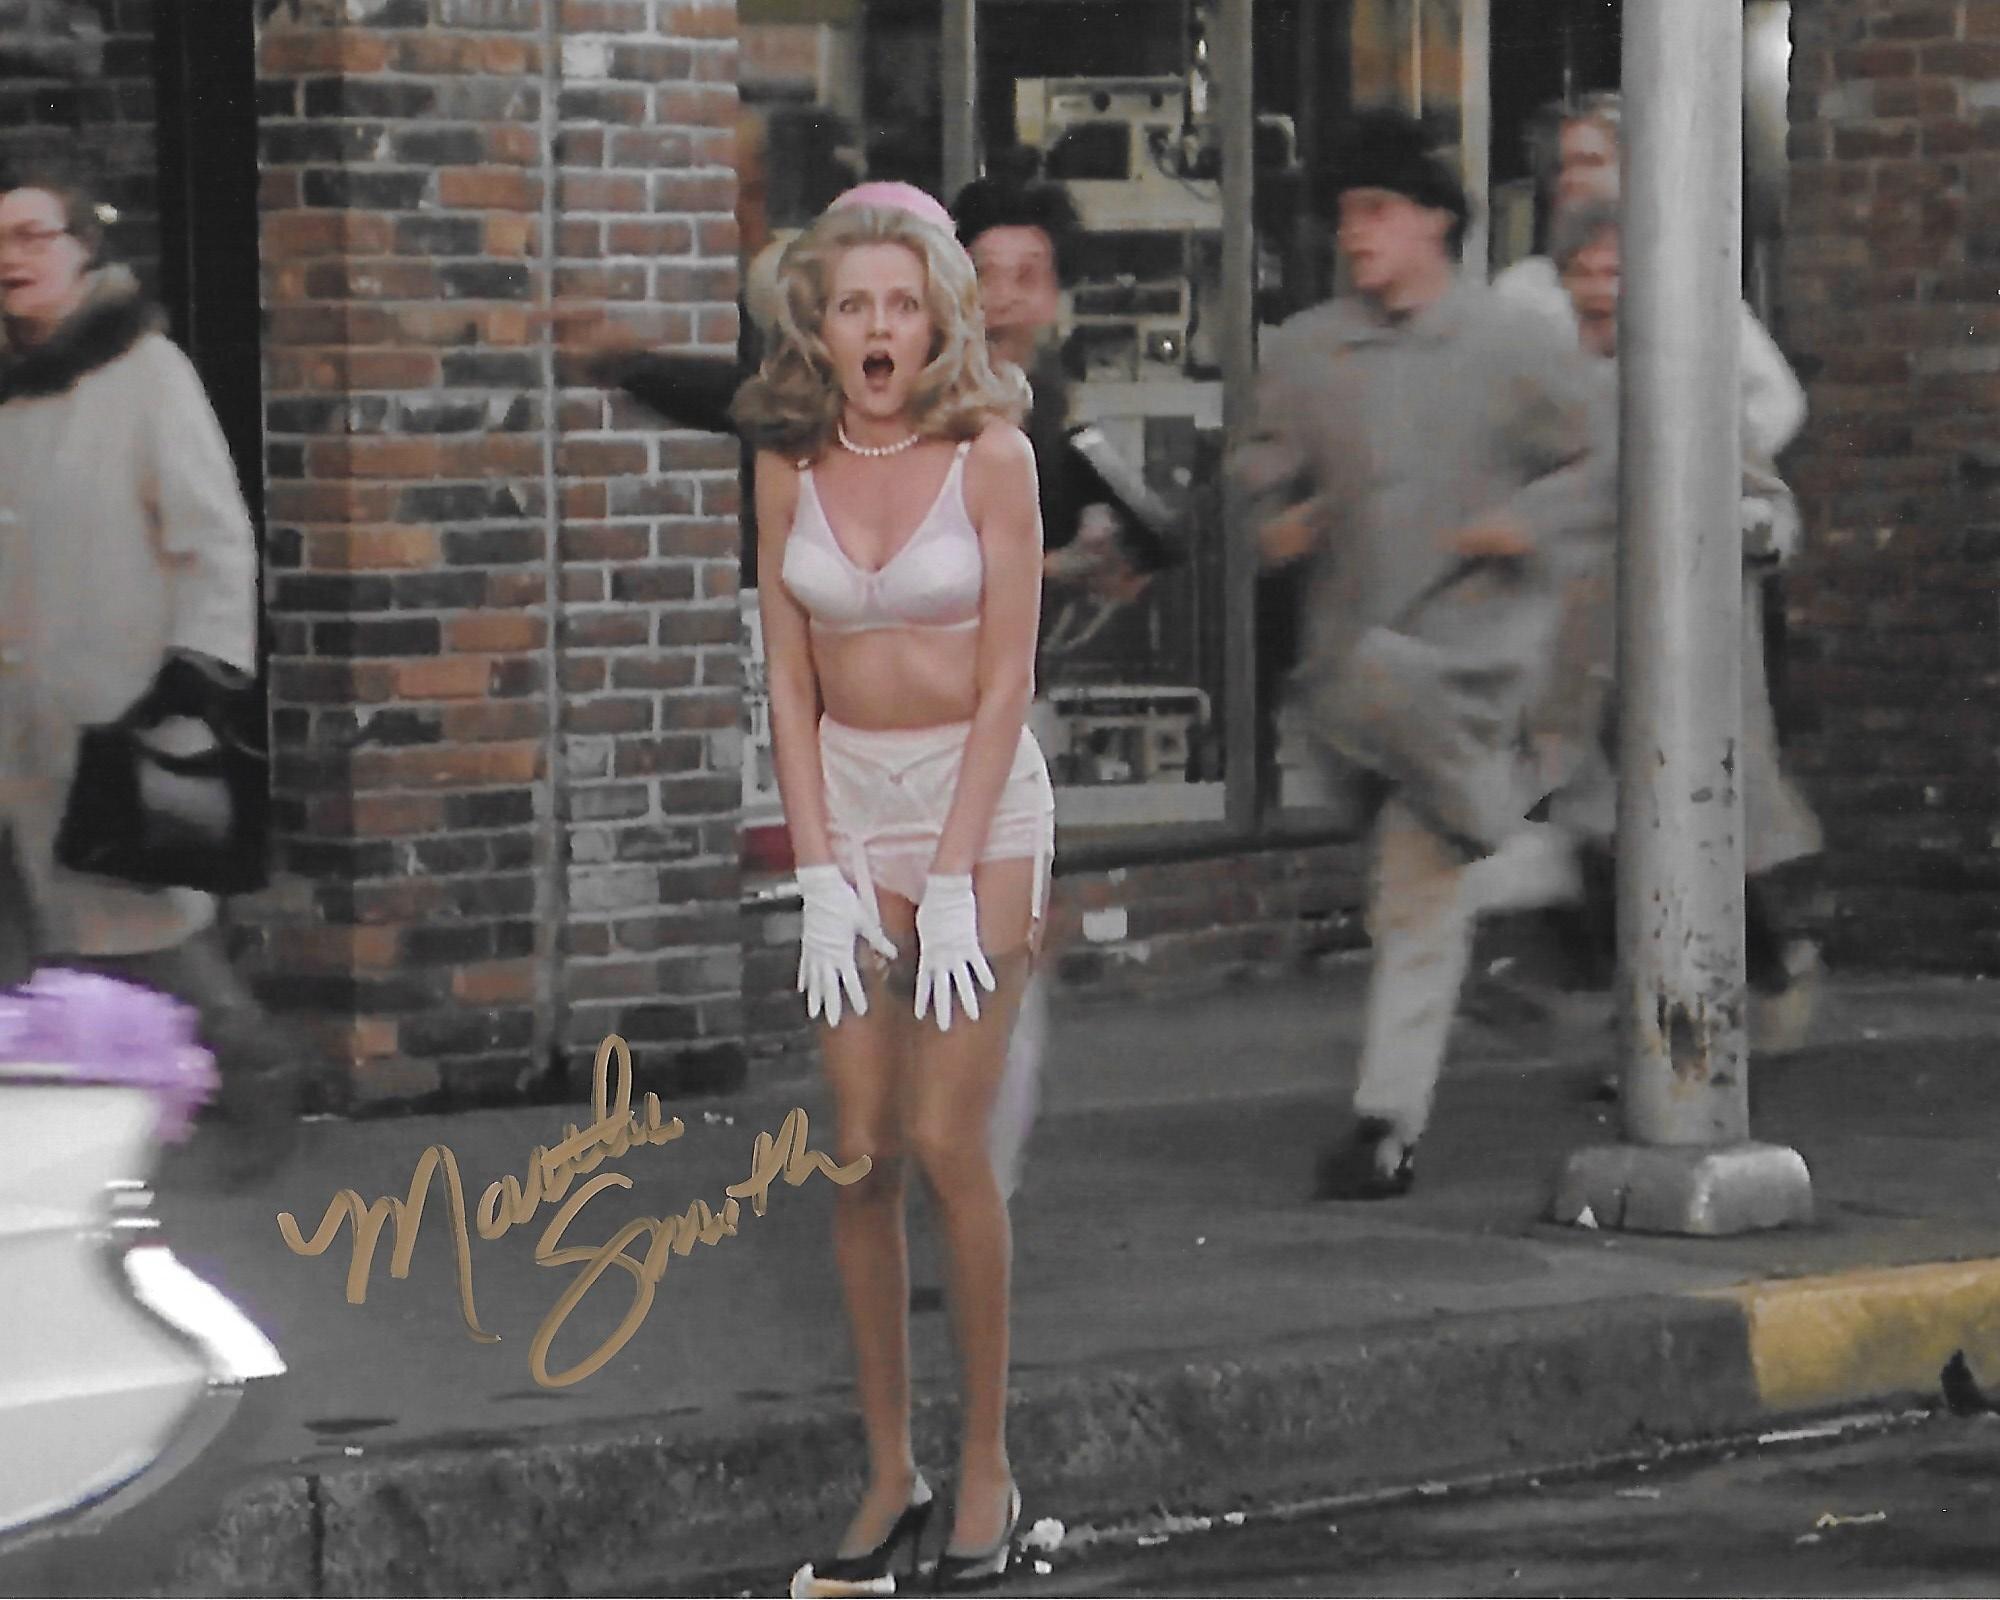 Ciara Sotto (b. 1980),Edana Romney Porno video Sheila Darcy,Simple Kapadia